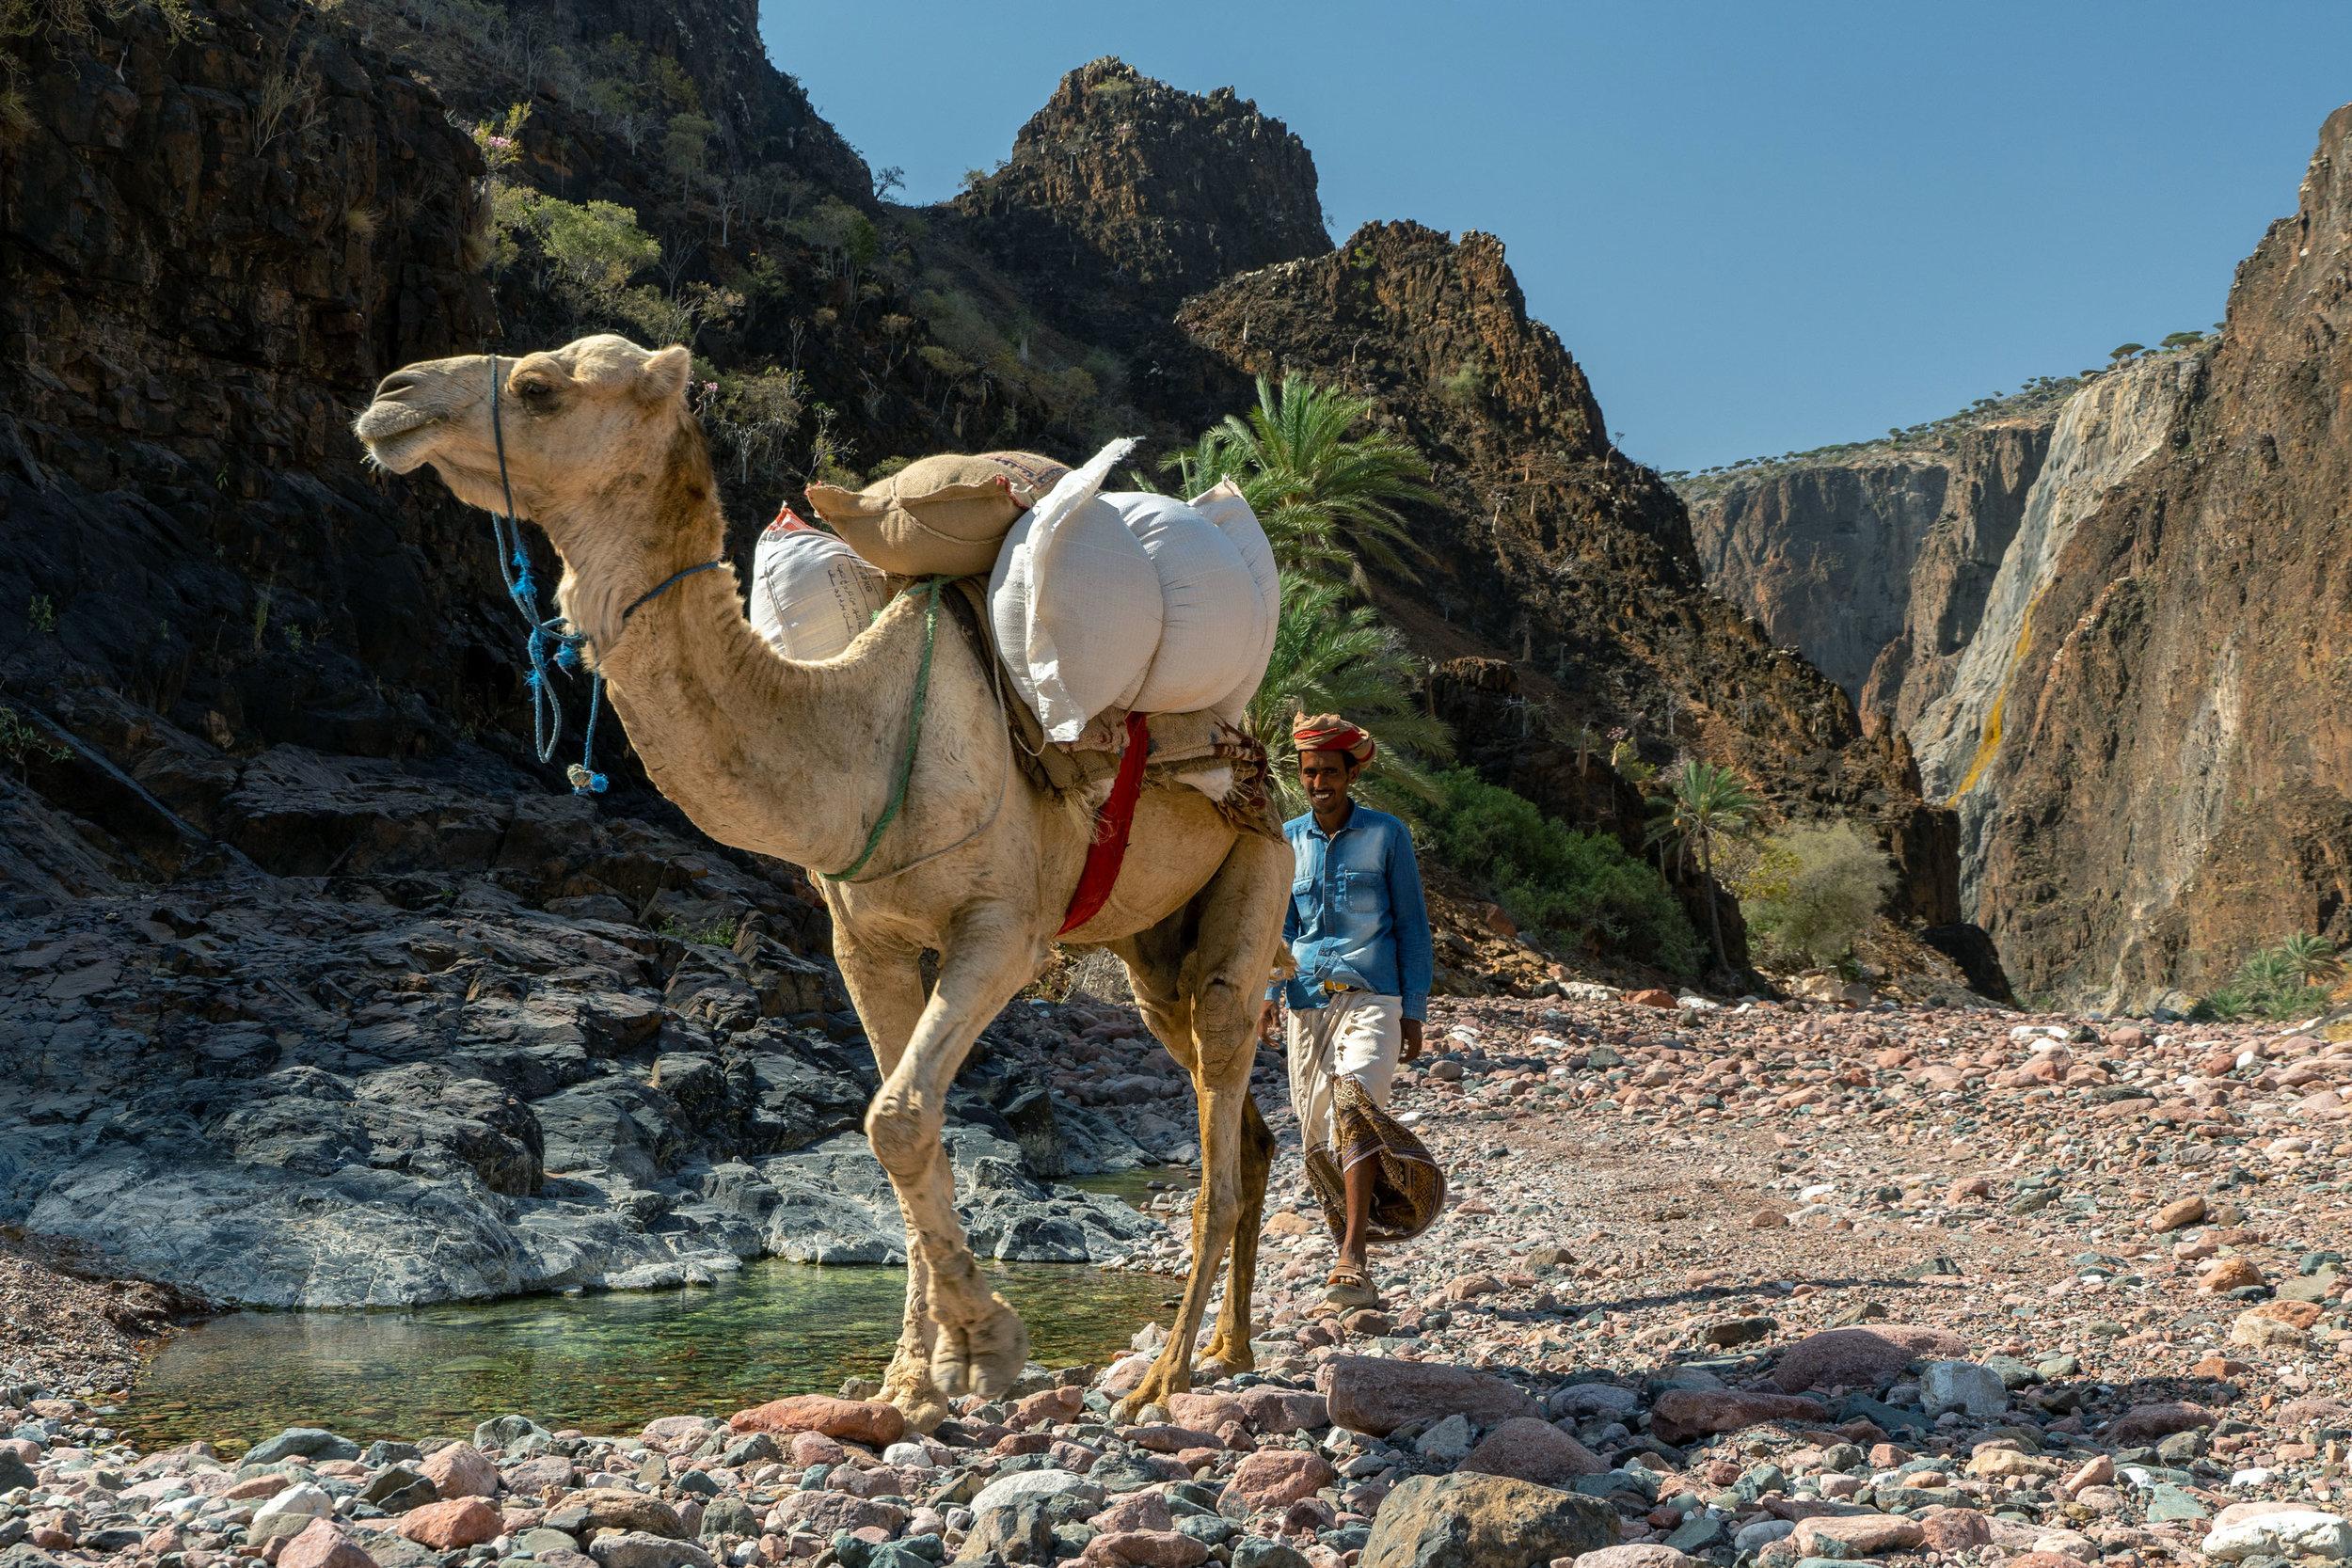 camel-trekking-in-durher-canyon-diksam-plateau-socotra-suqotra-island-yemen.jpg